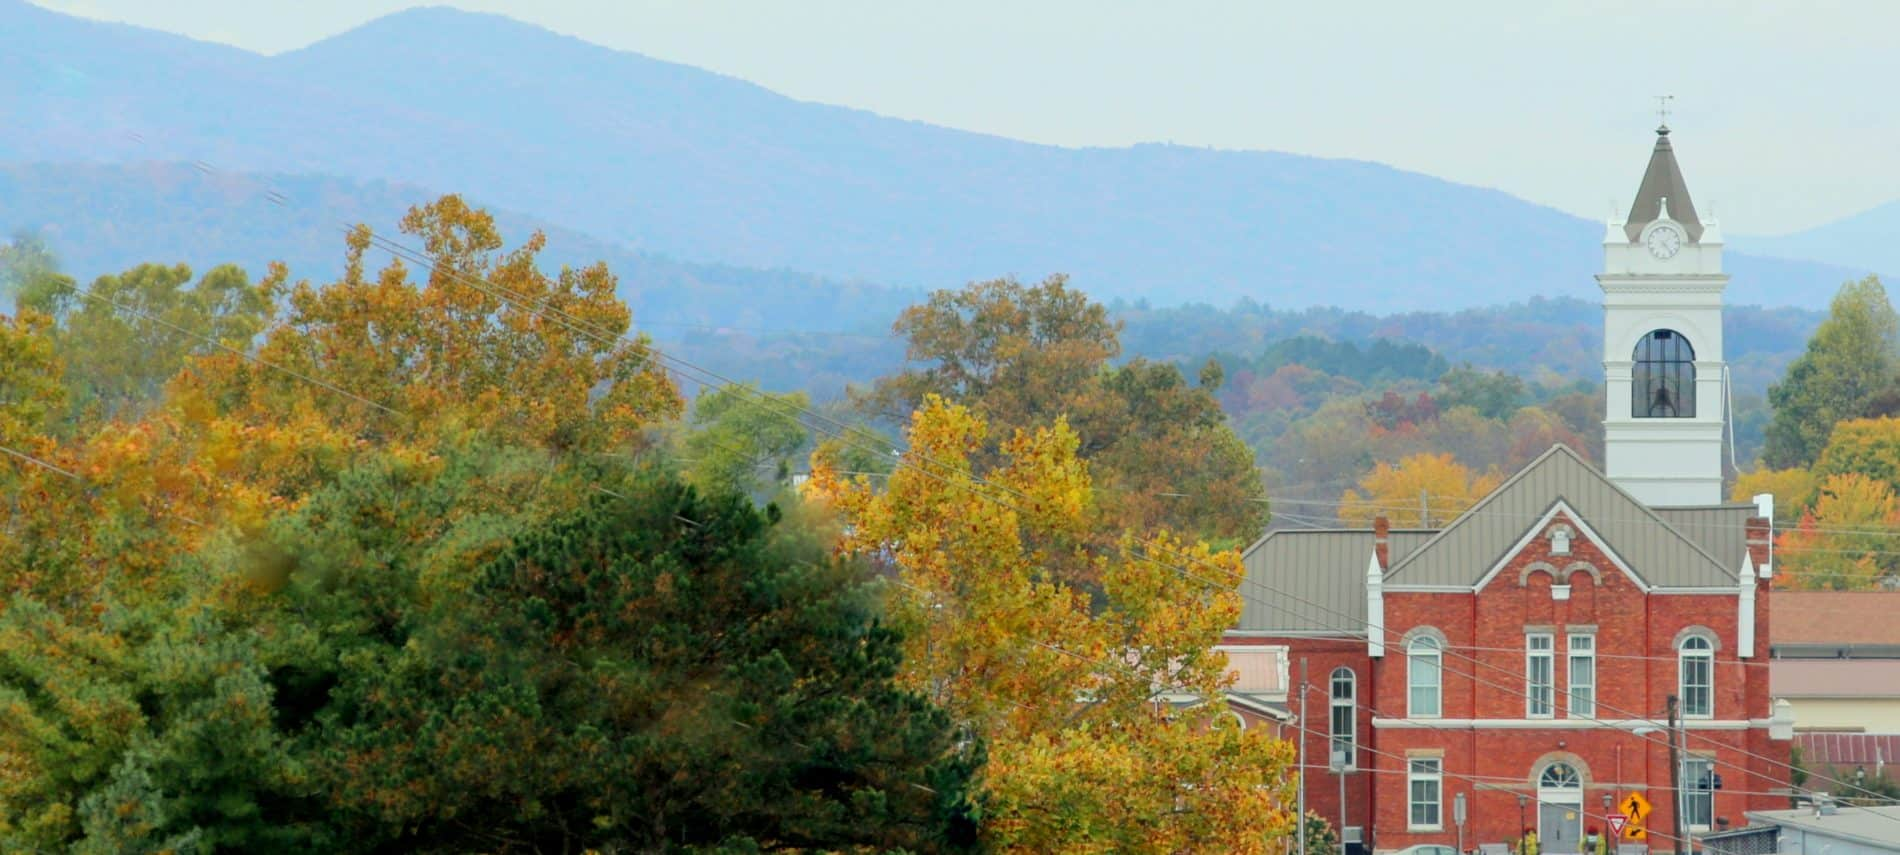 Pretty postcard scene of Blairsville downtown in autumn of a church . Title: Blairsville, Georgia,